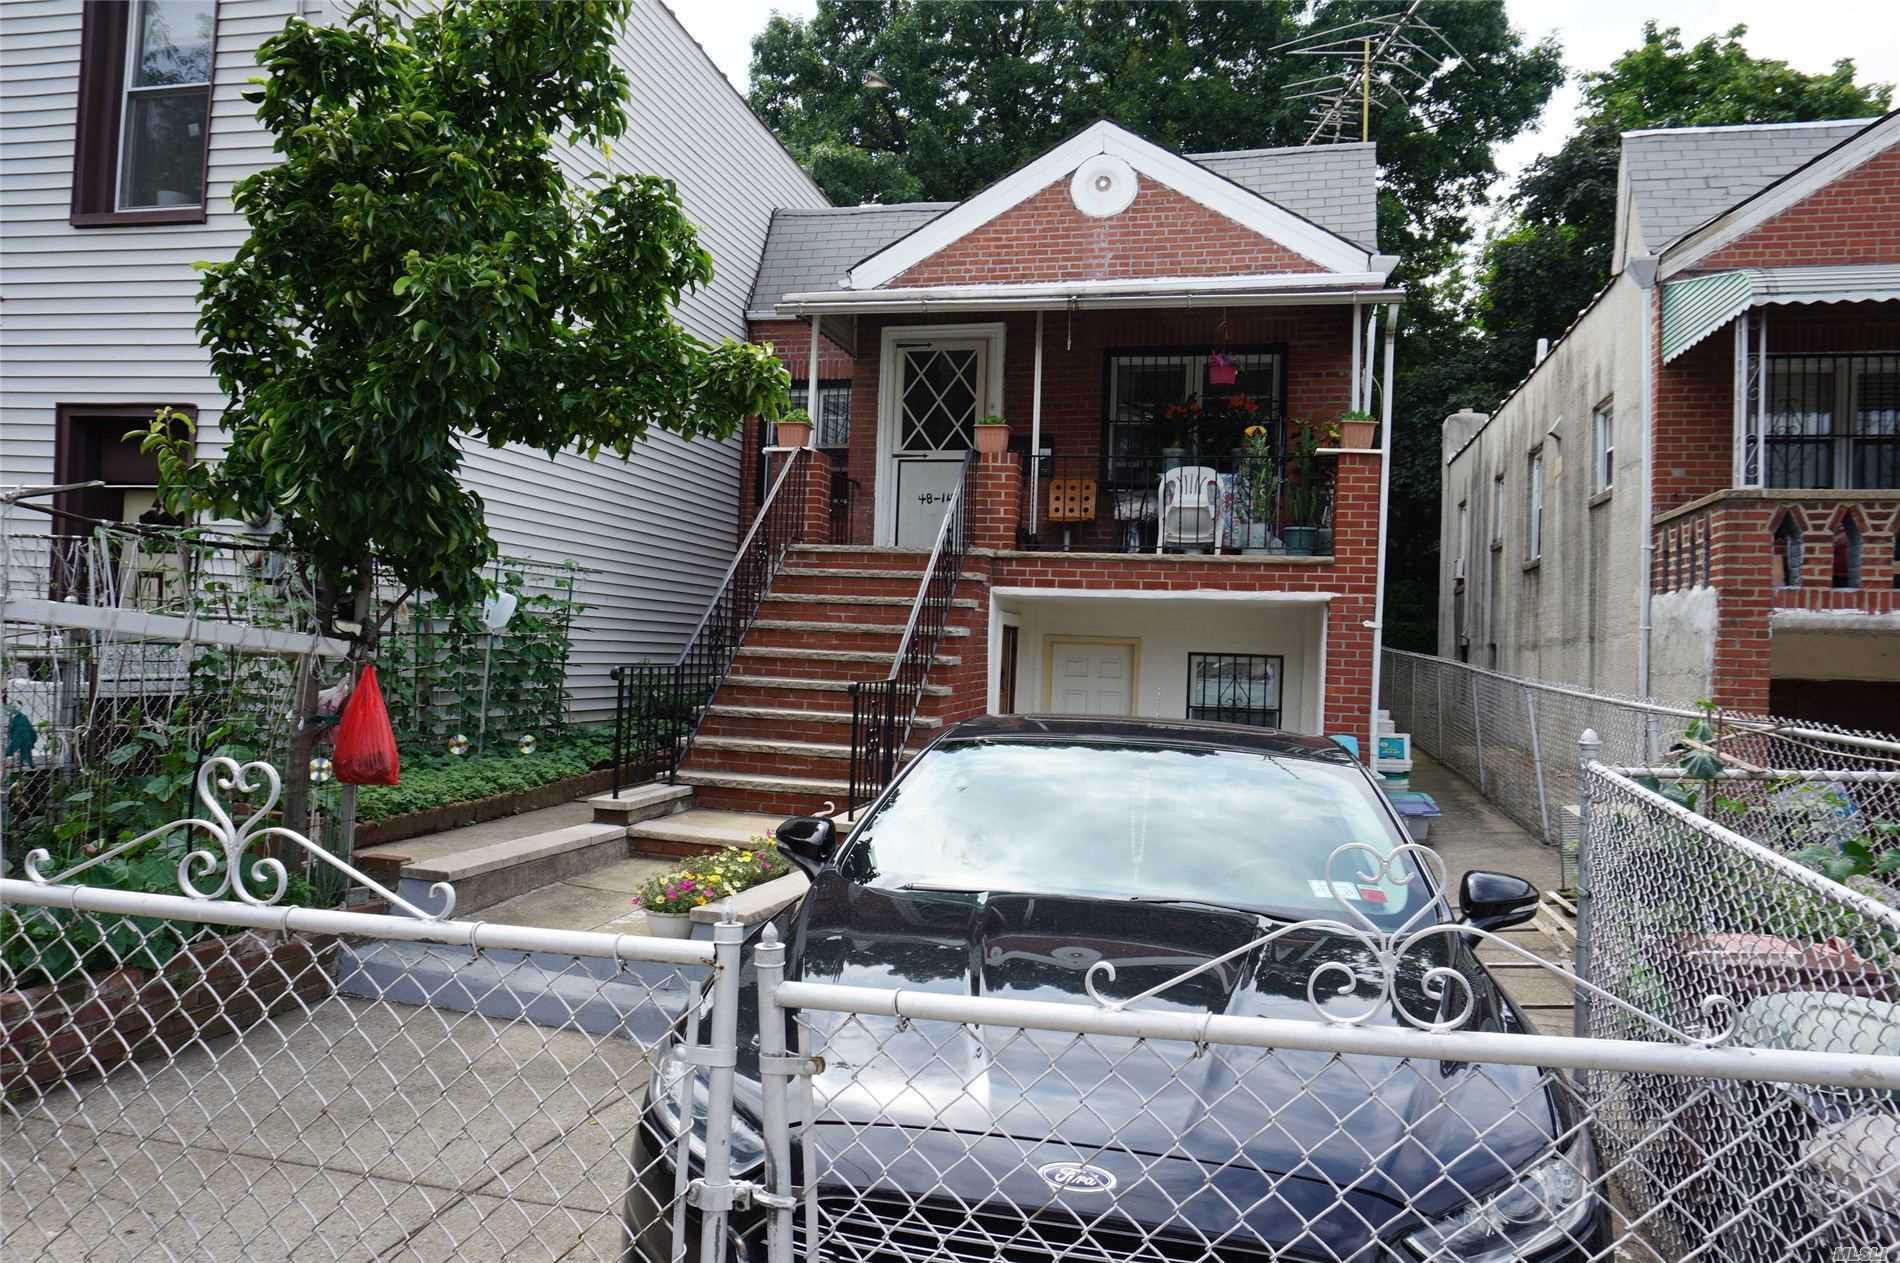 Property for sale at 4814 39th Street, Sunnyside NY 11104, Sunnyside,  New York 11104